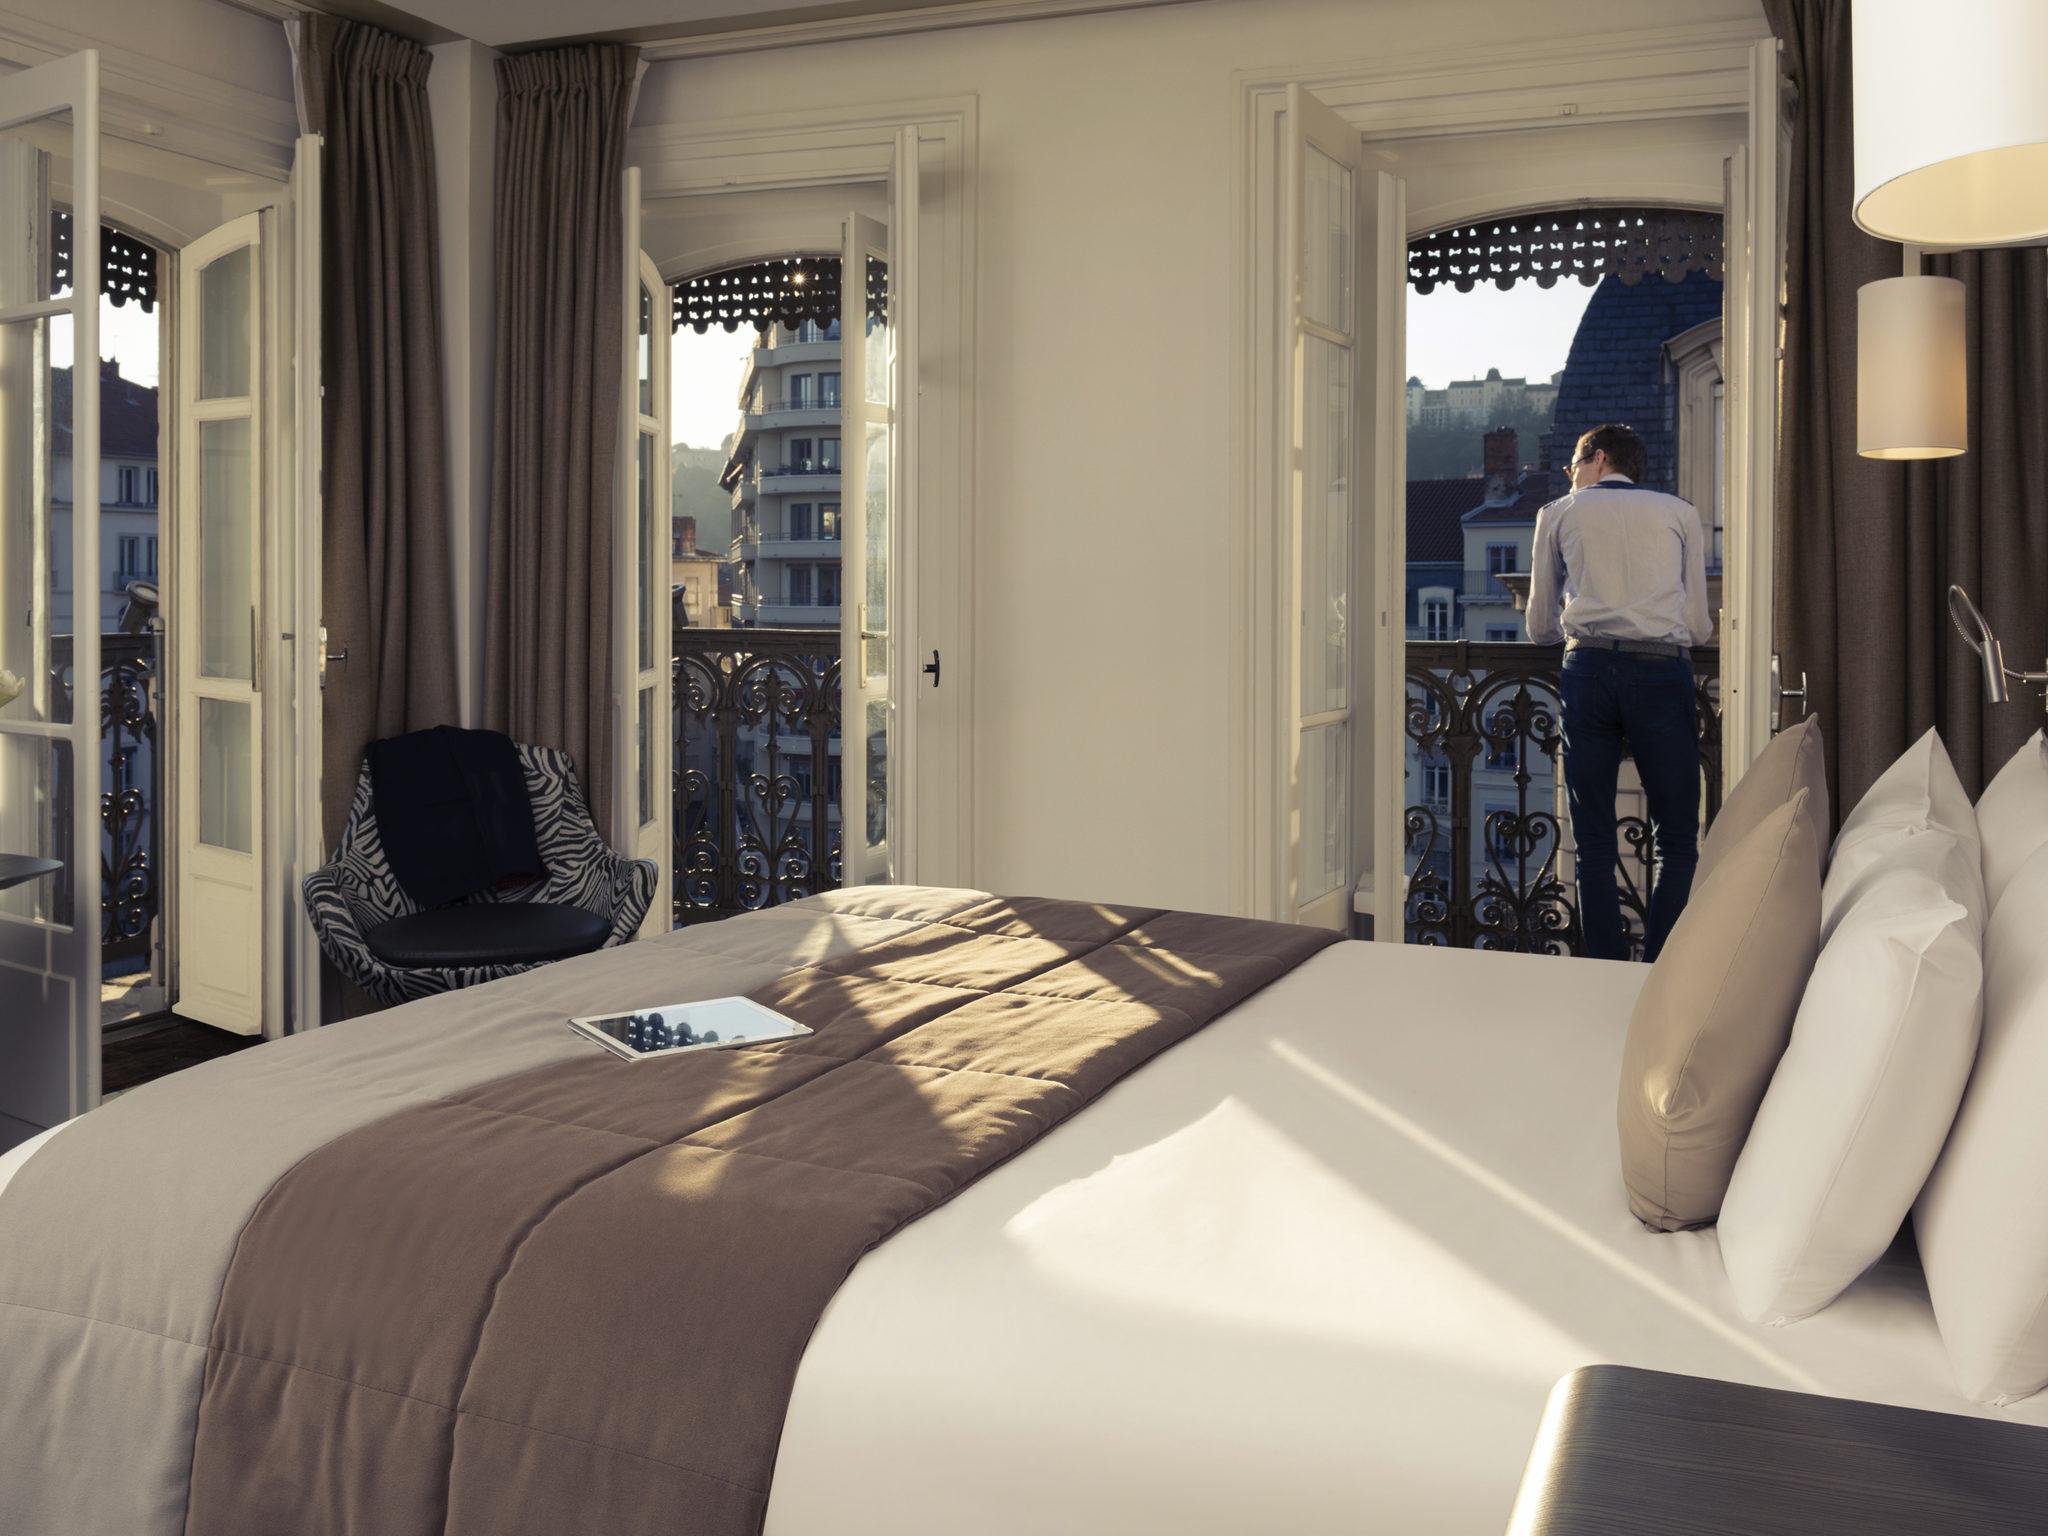 Otel – Mercure Lyon Centre Beaux Arts oteli